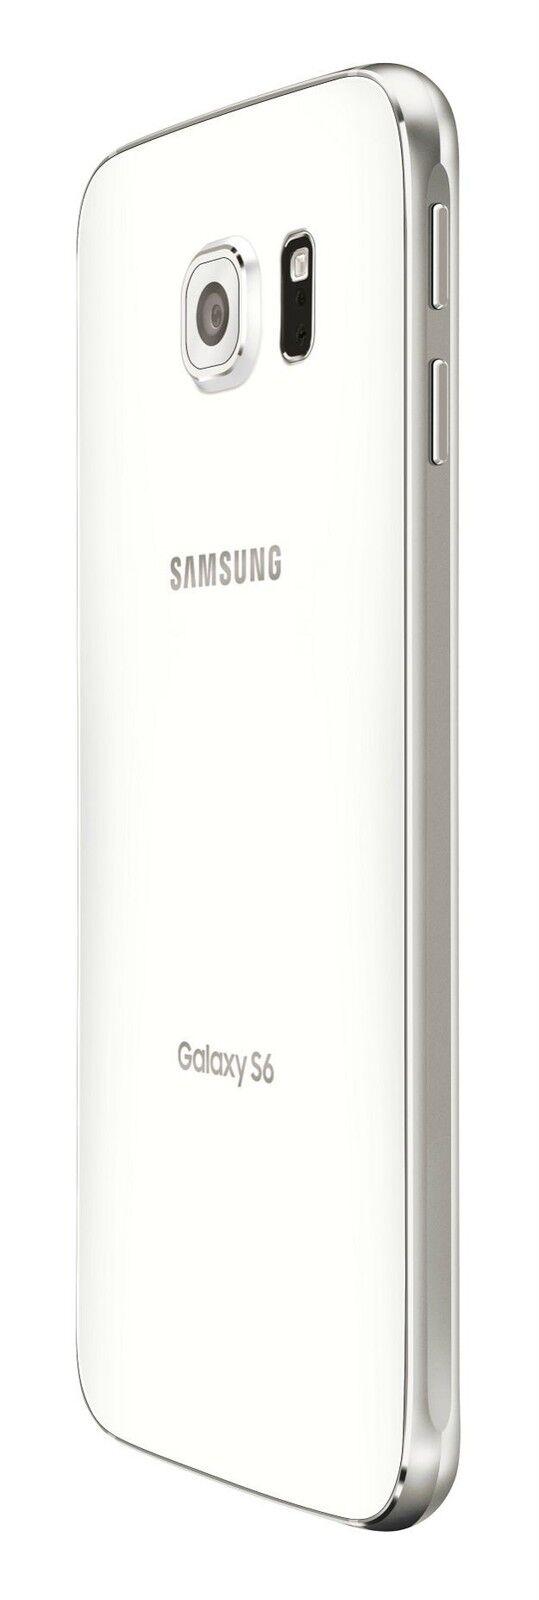 Samsung Galaxy S6 SM-G920T - 64GB - White Pearl (T-Mobile) Smartphone